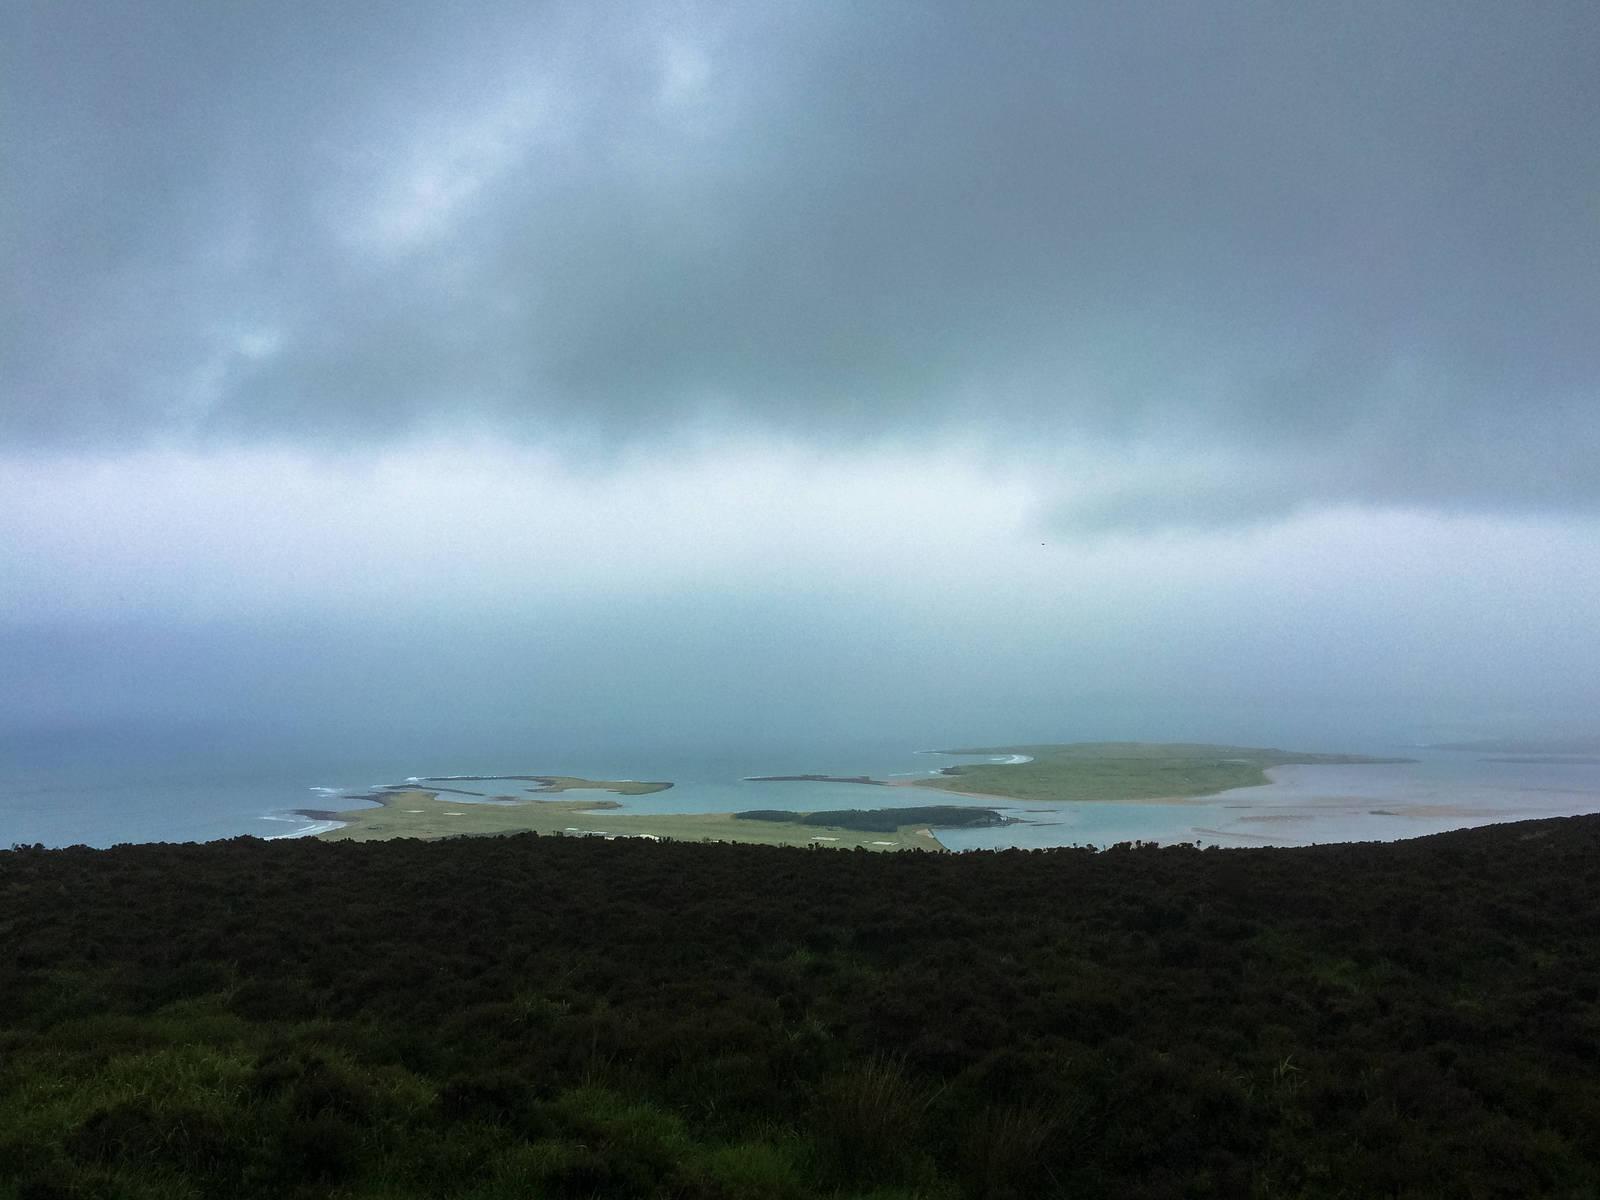 Sligo Bay from Knocknarea